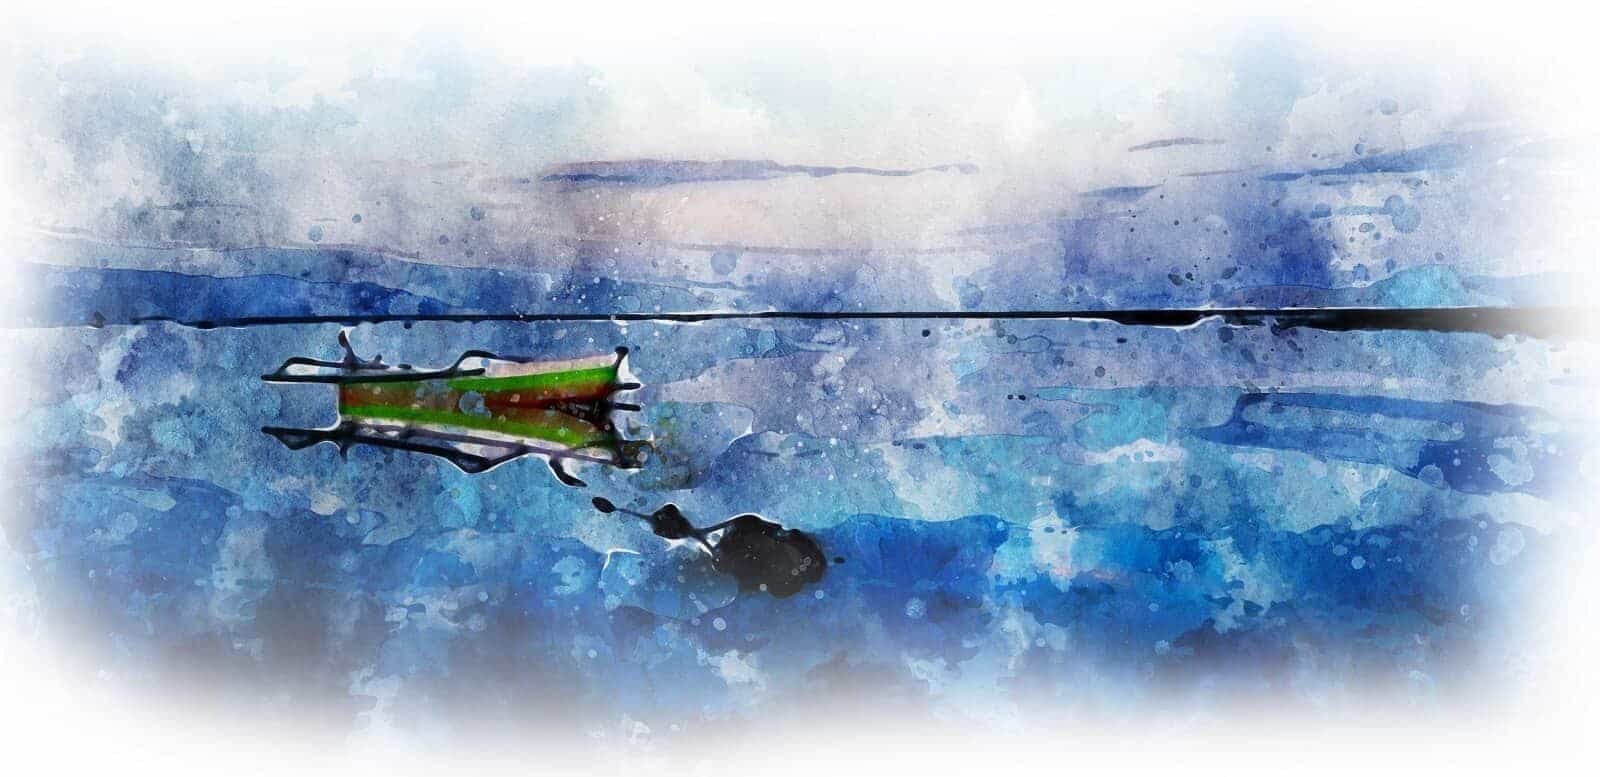 Boat Sumbawa mer